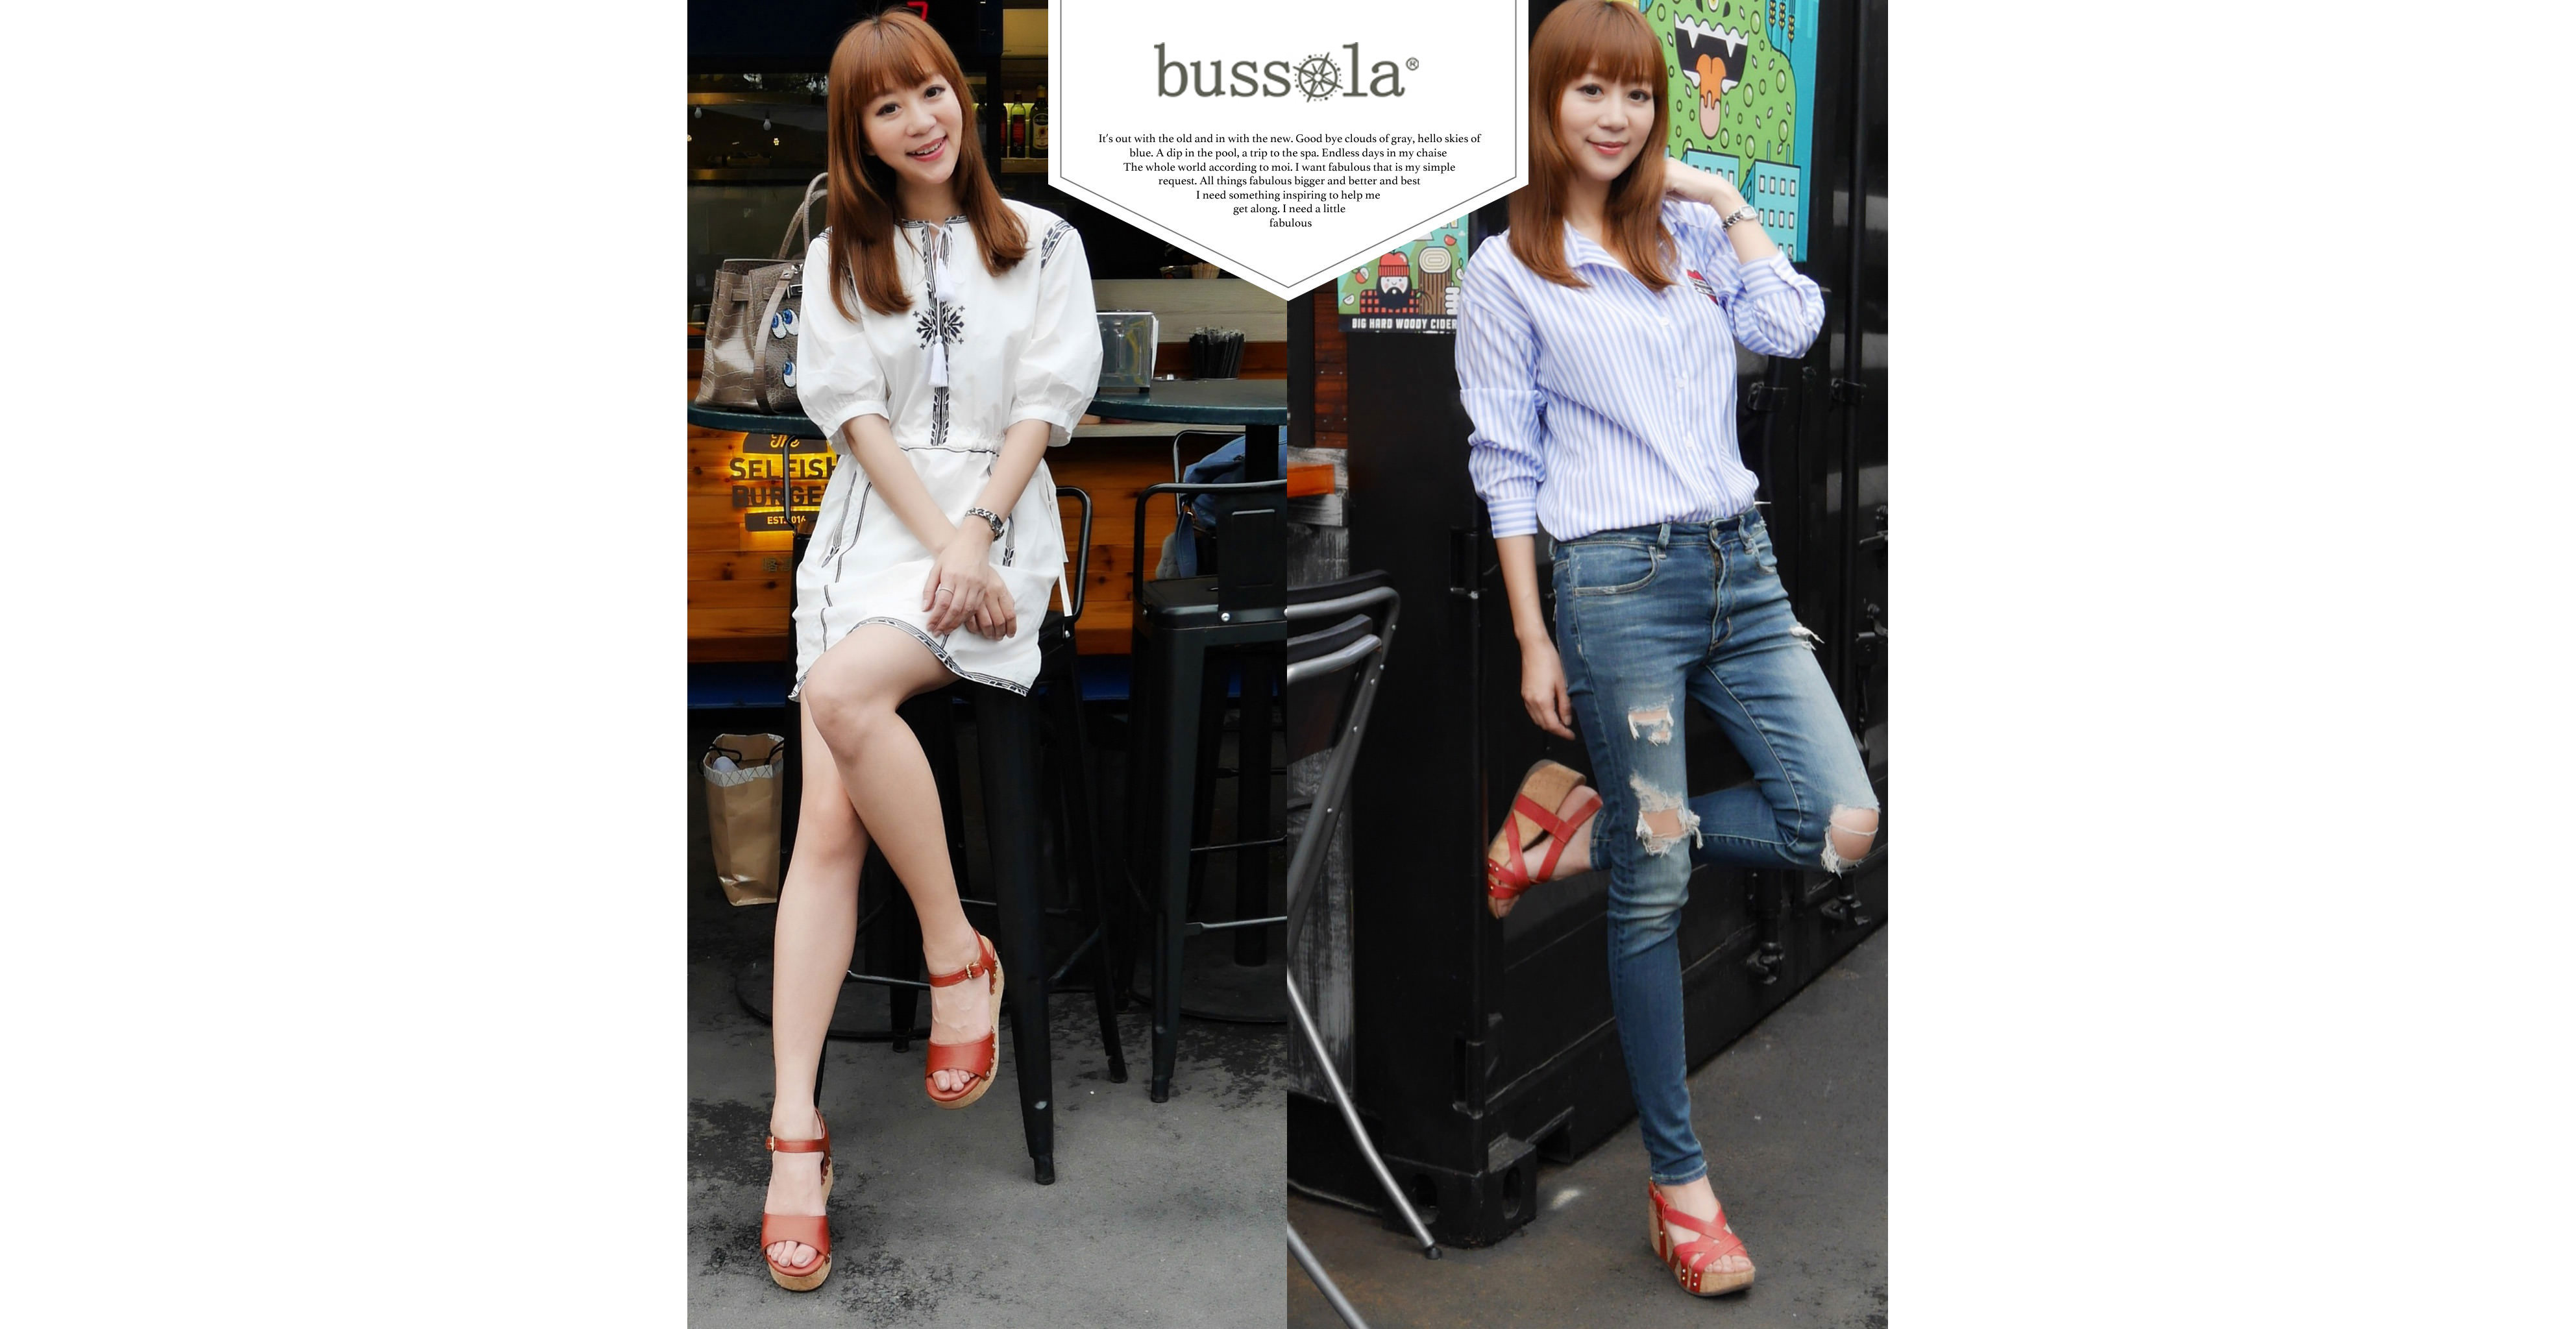 Bussola好穿好走的美鞋代名詞♥ 來自義大利的時尚經典♥2017兩款夏日必備美腿涼鞋示範穿搭(≧∇≦)/